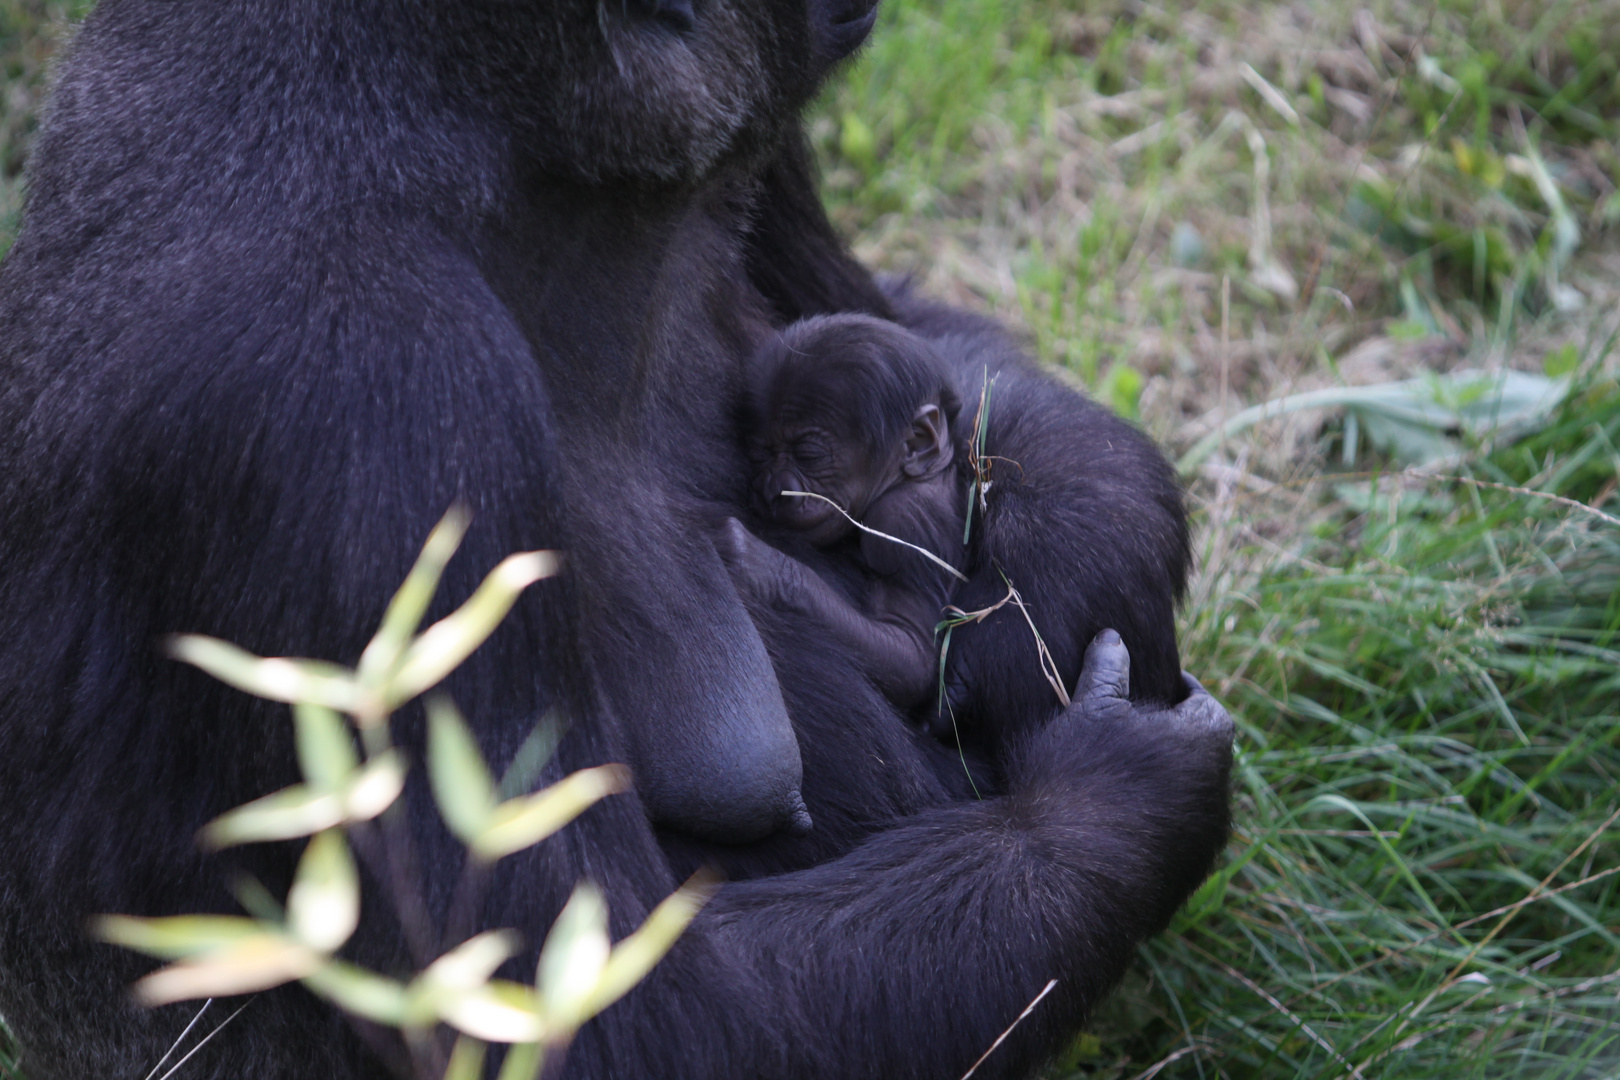 Gorillababy 1